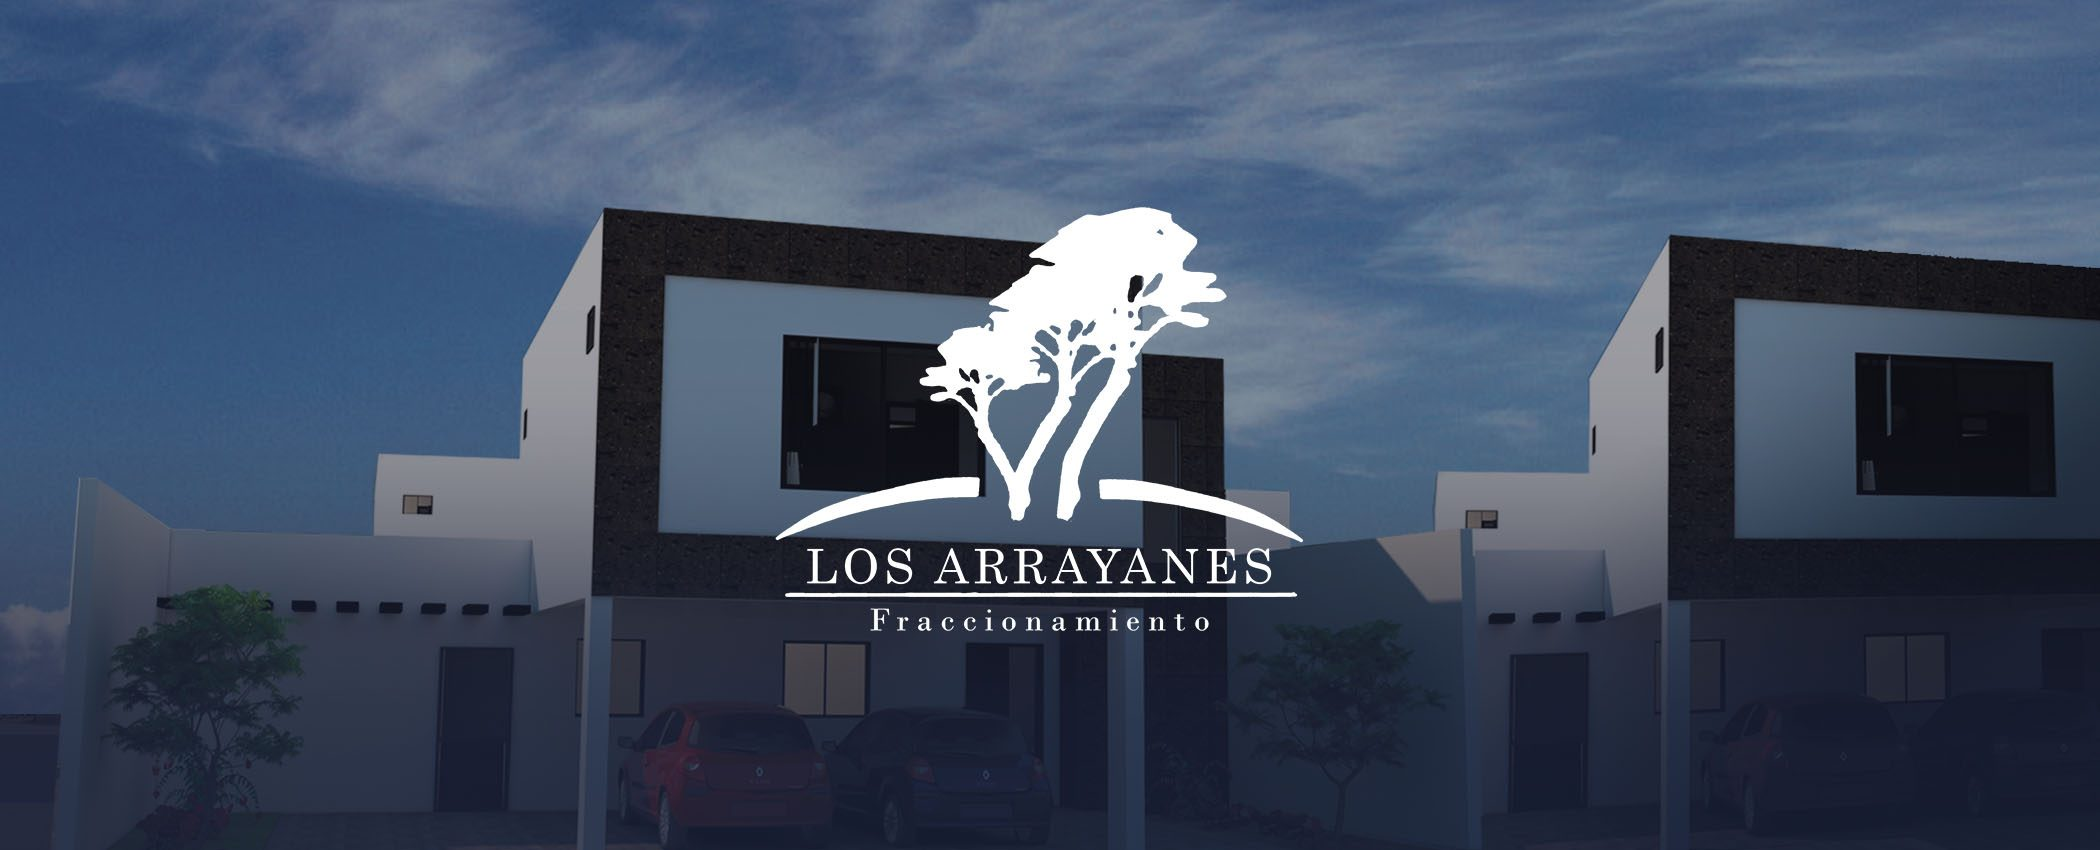 banner 2 principal arrayanes